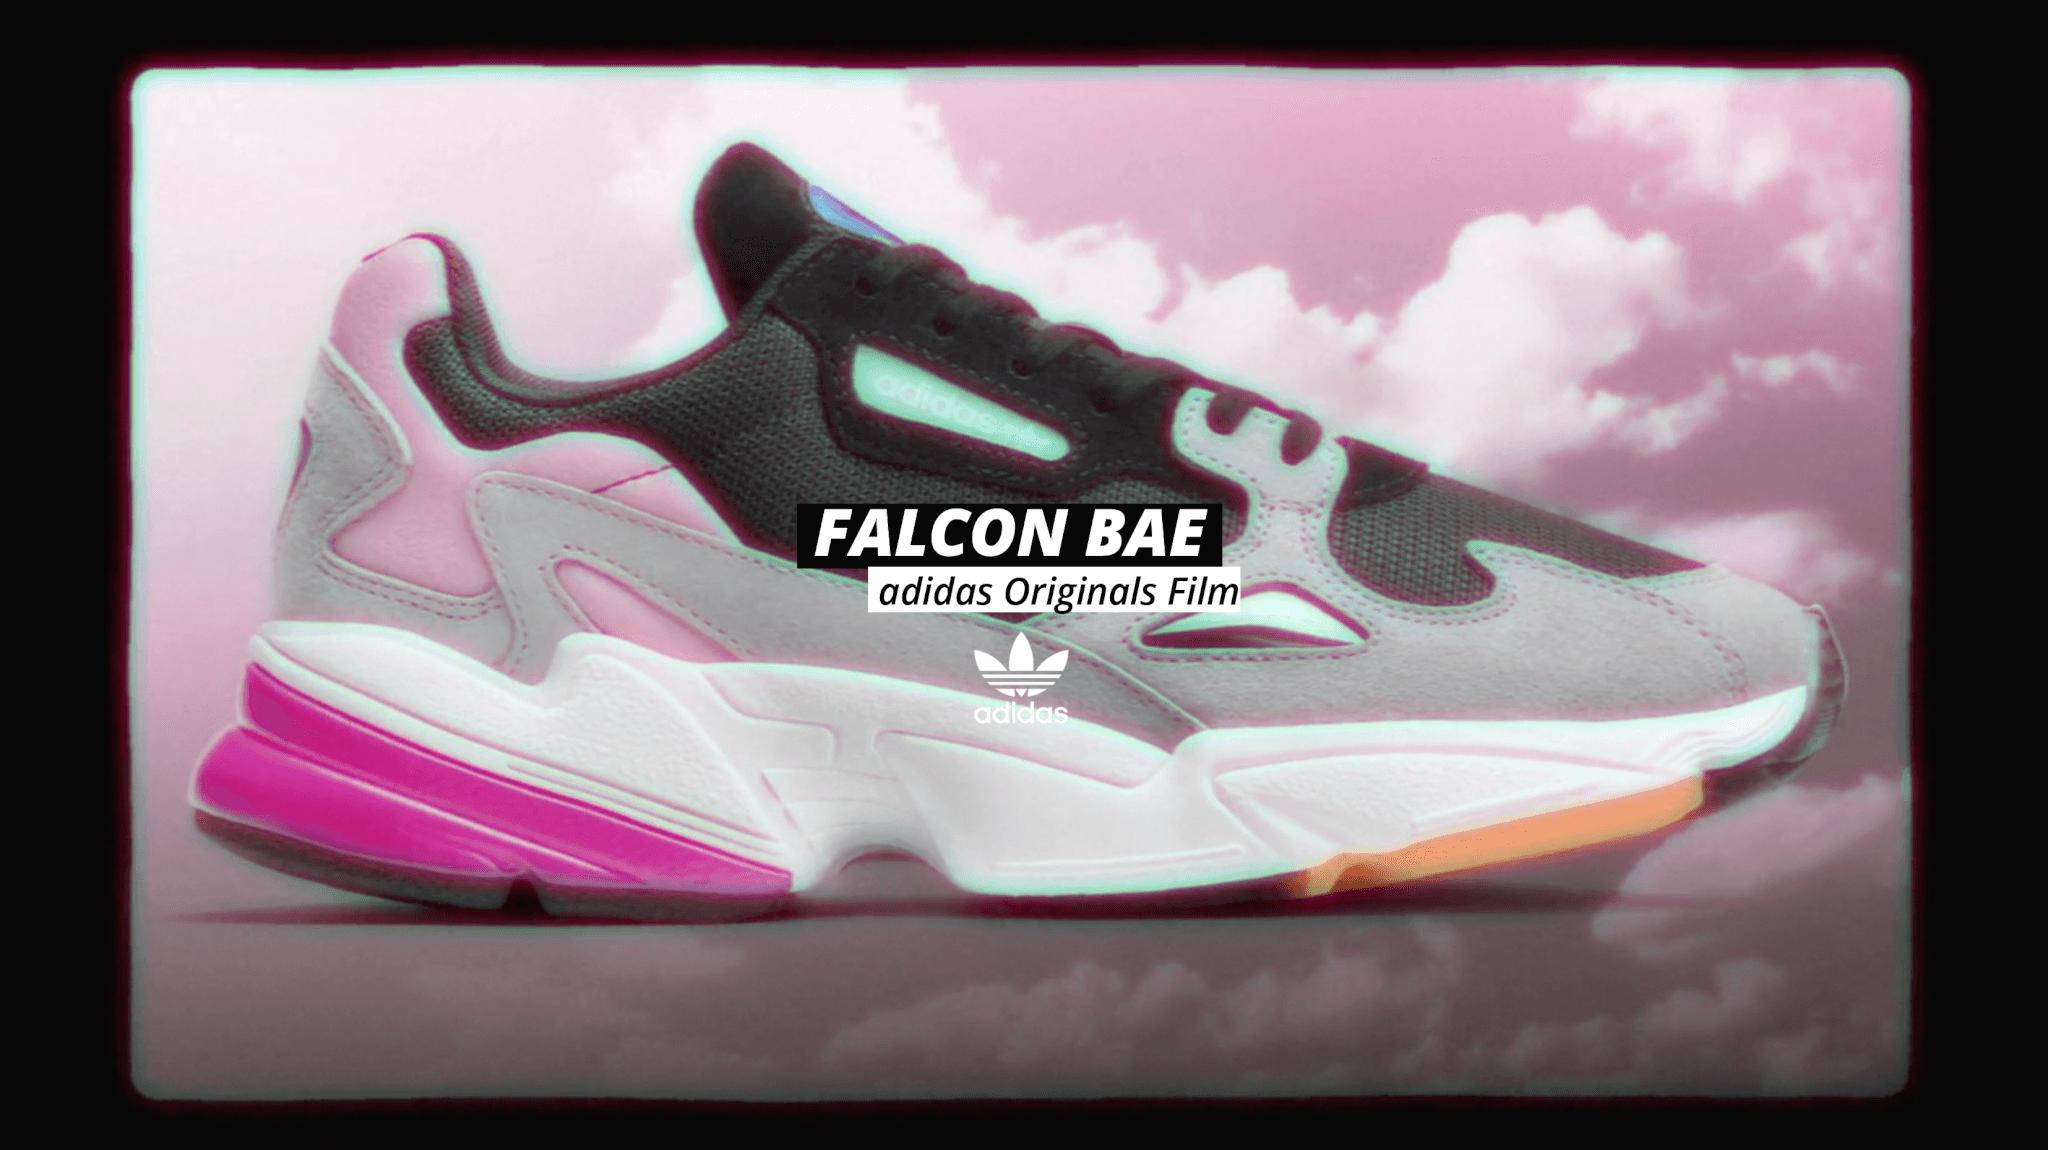 adidas Falcon Bae